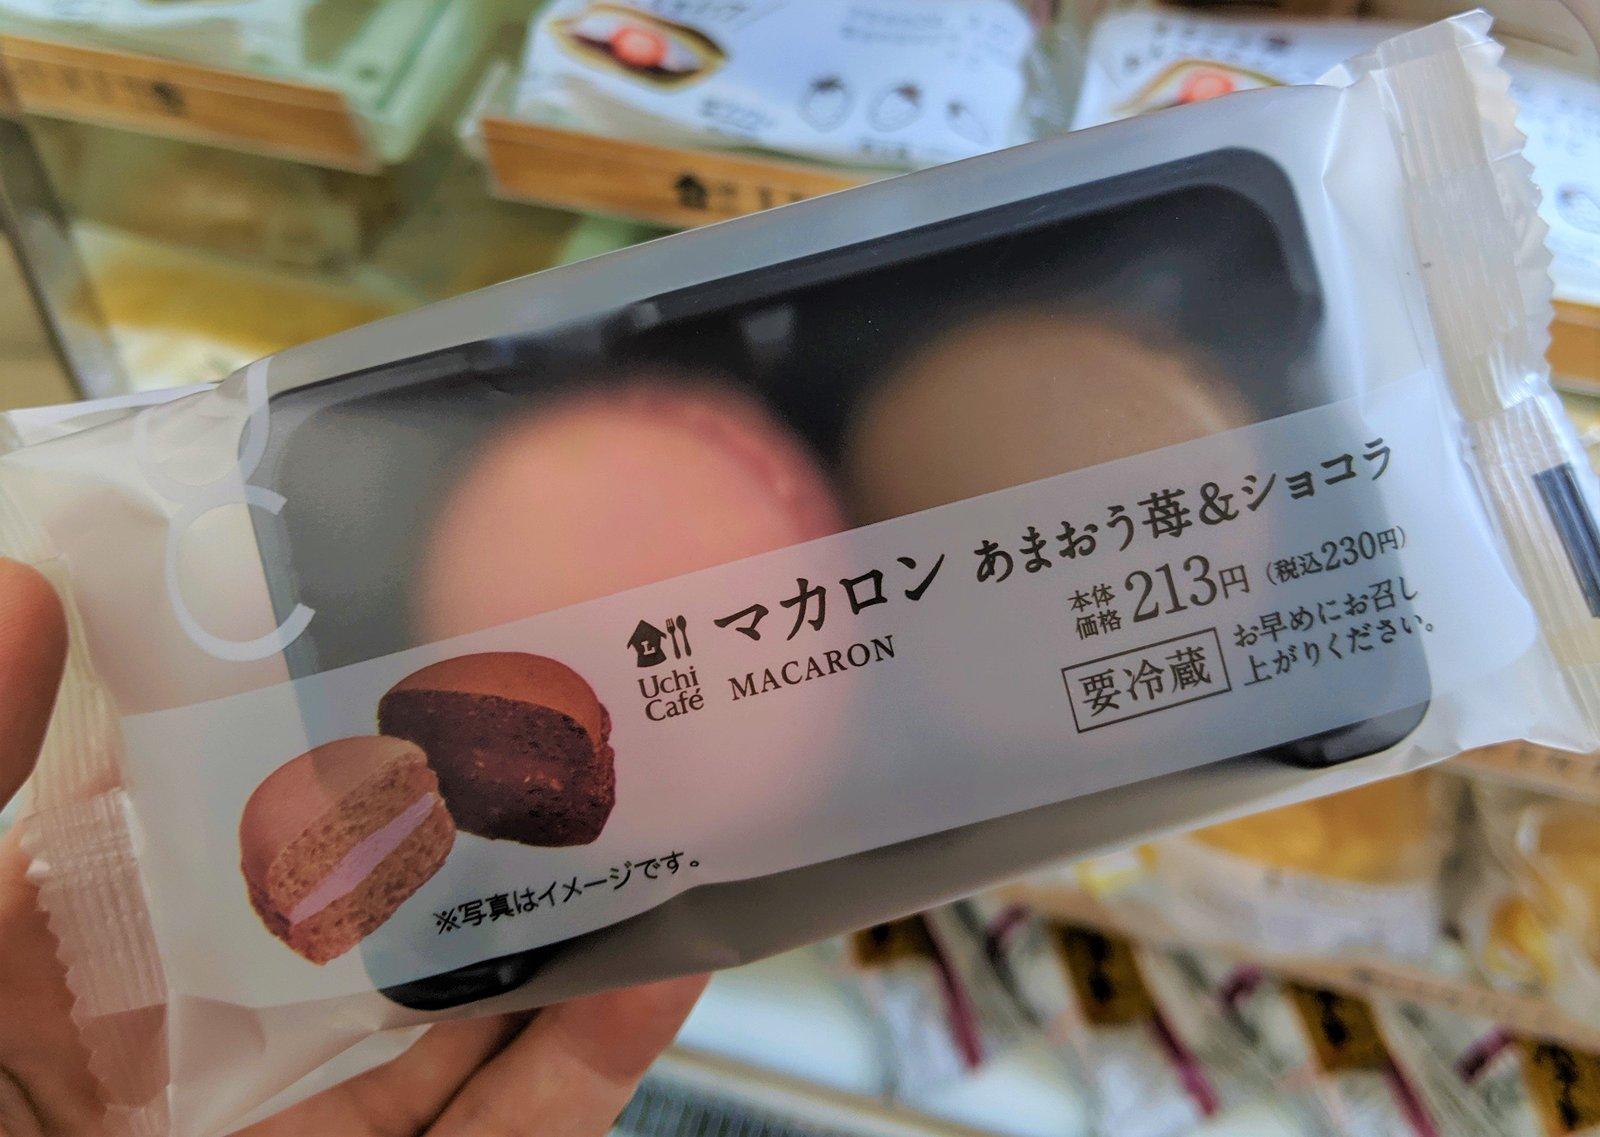 uchi cafe macarons 2020 sakura cherry blossom sweets japan